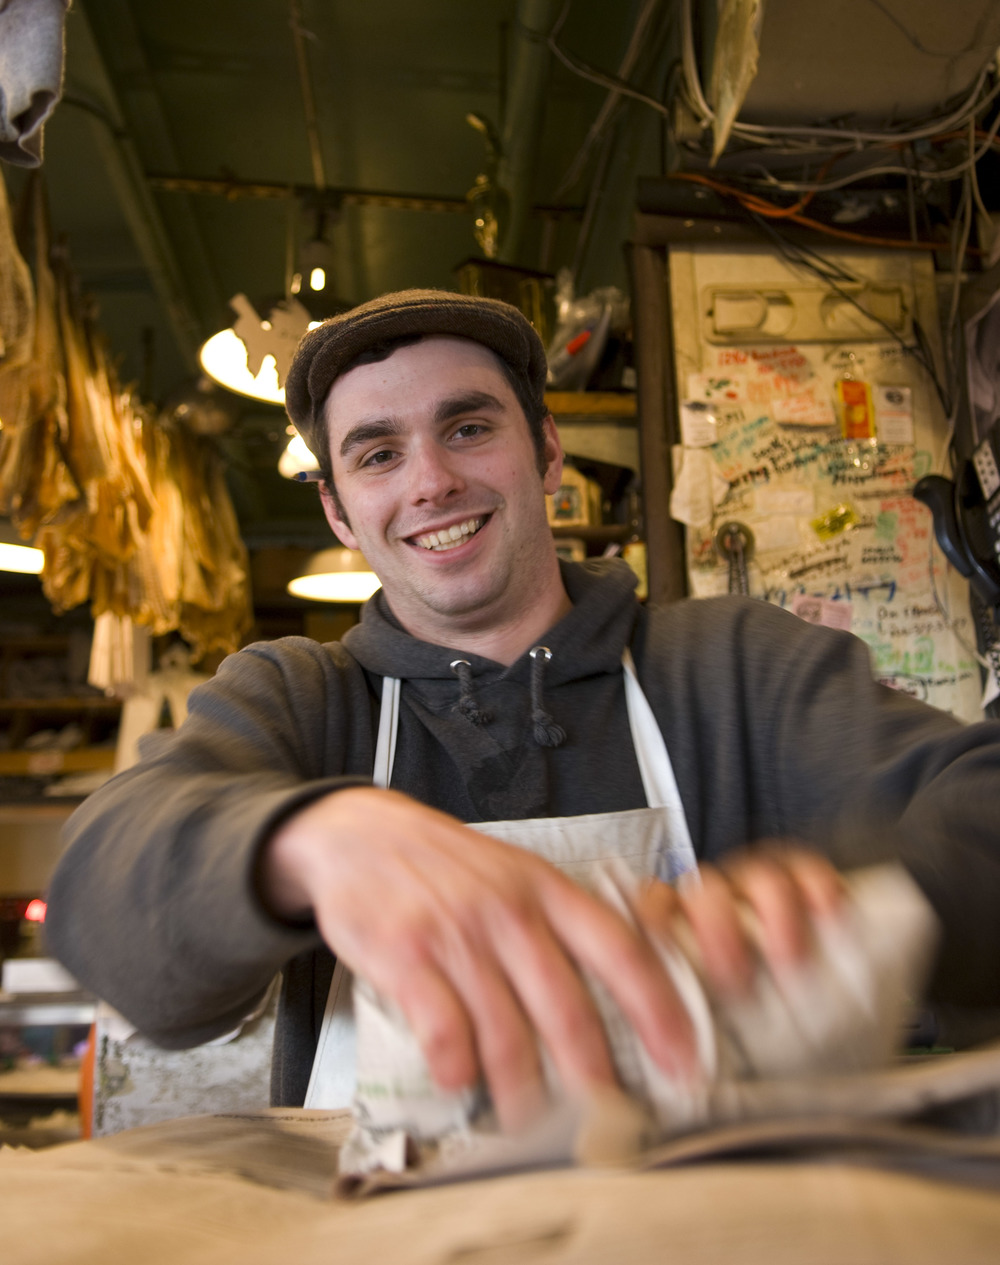 Ryan / Seattle 2008